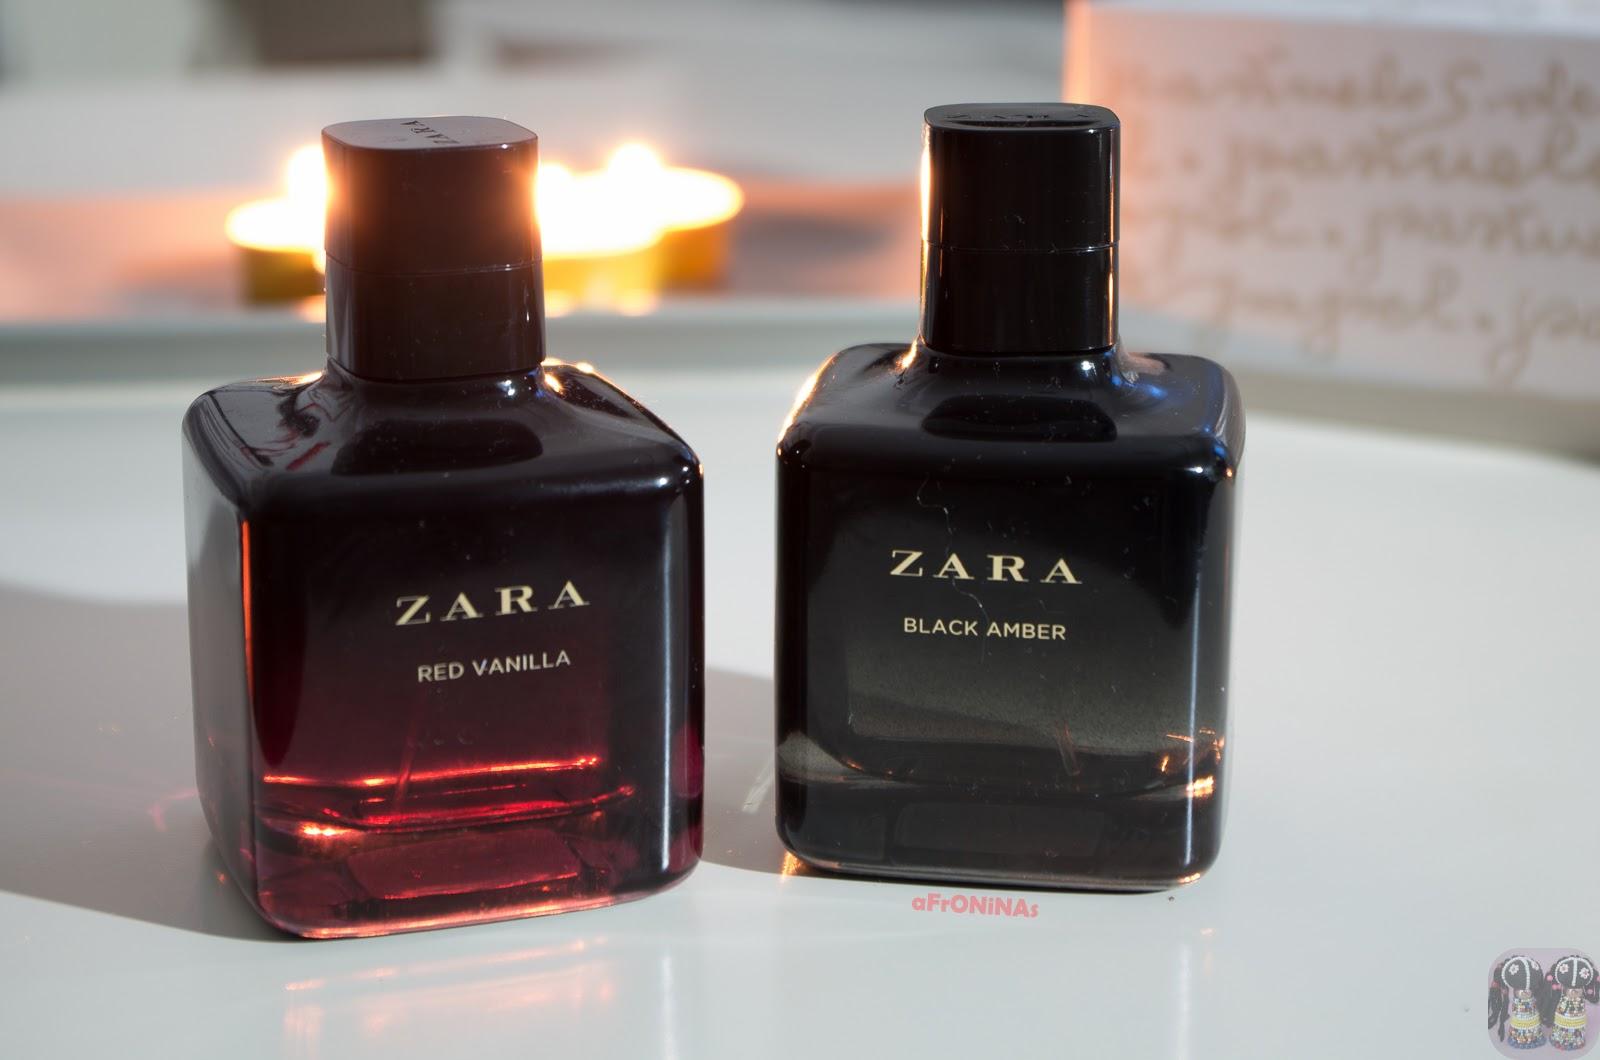 zara red vanilla black amber vainilla perfume